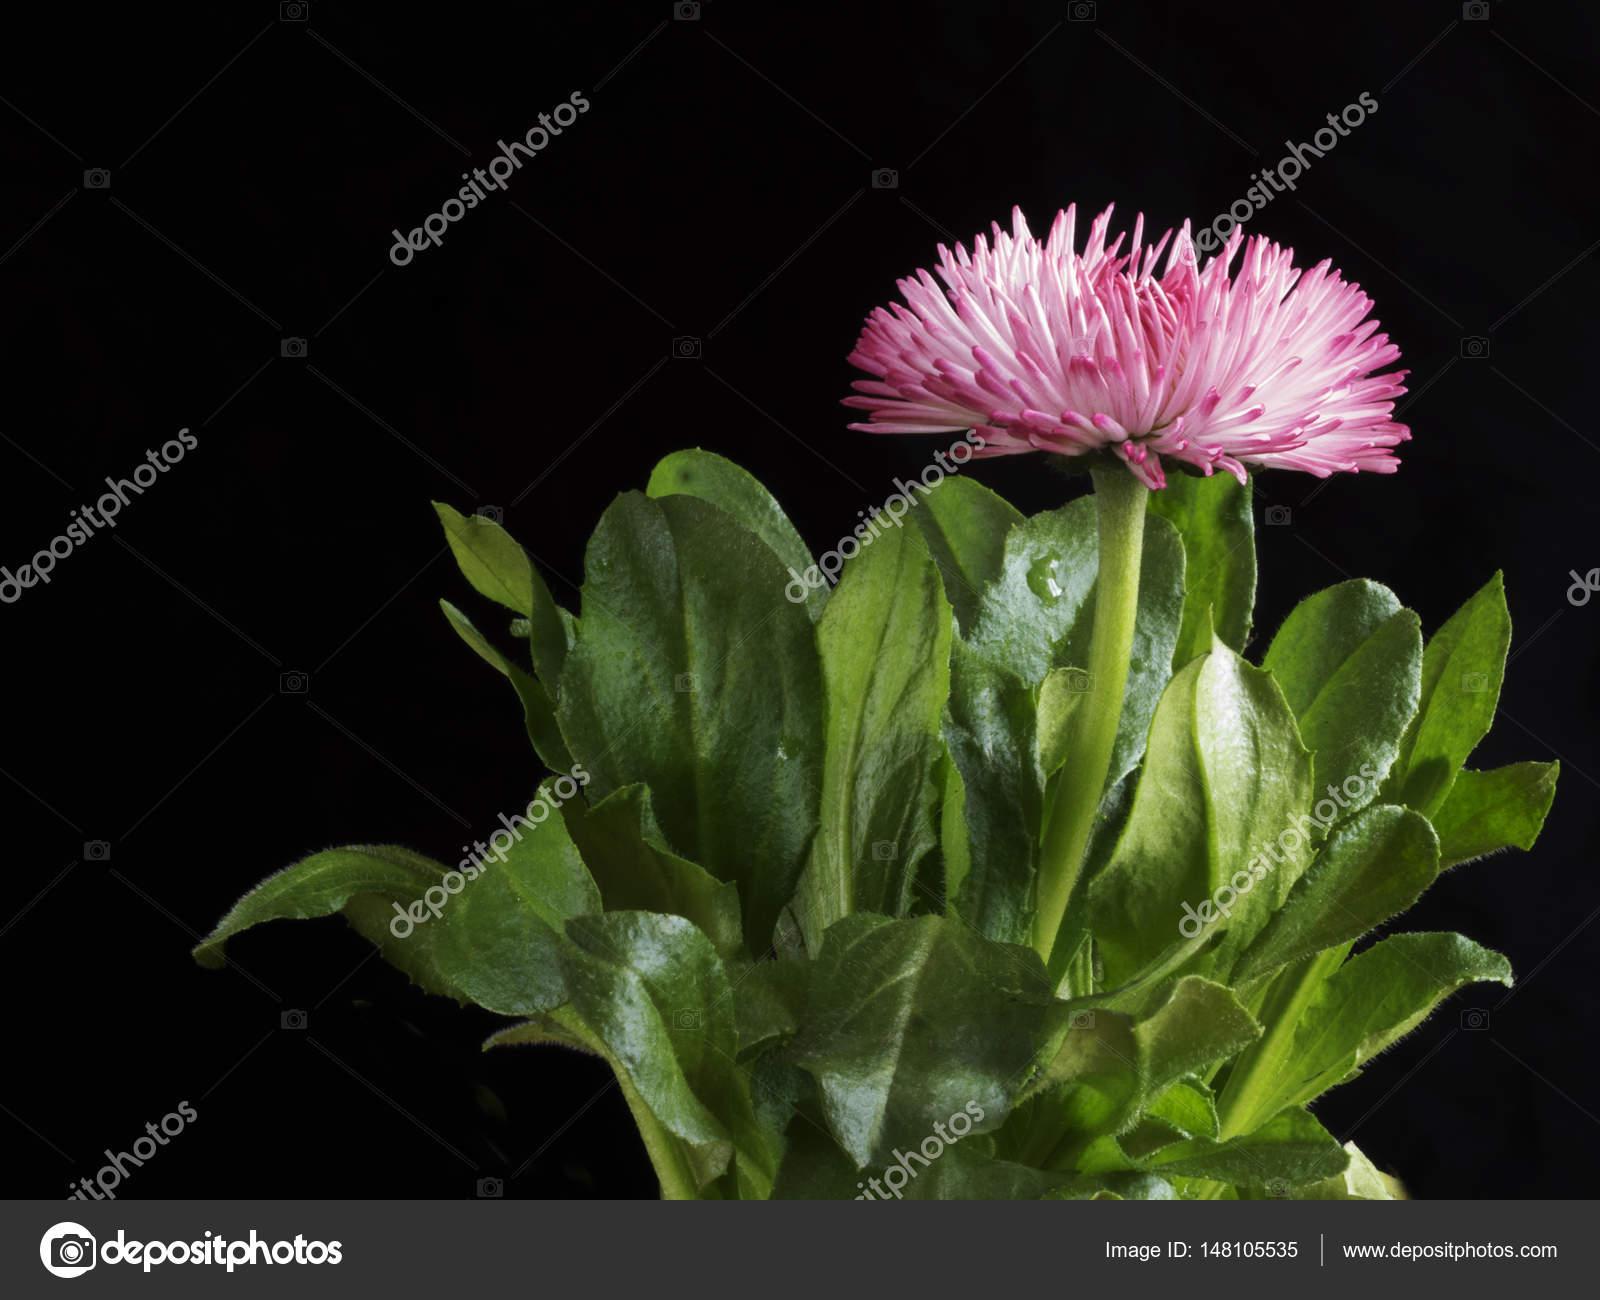 Red daisy flower head stock photo igorgolovniov 148105535 pink daisy flower head on black background bellis perennis english daisy asteraceae macro photo by igorgolovniov izmirmasajfo